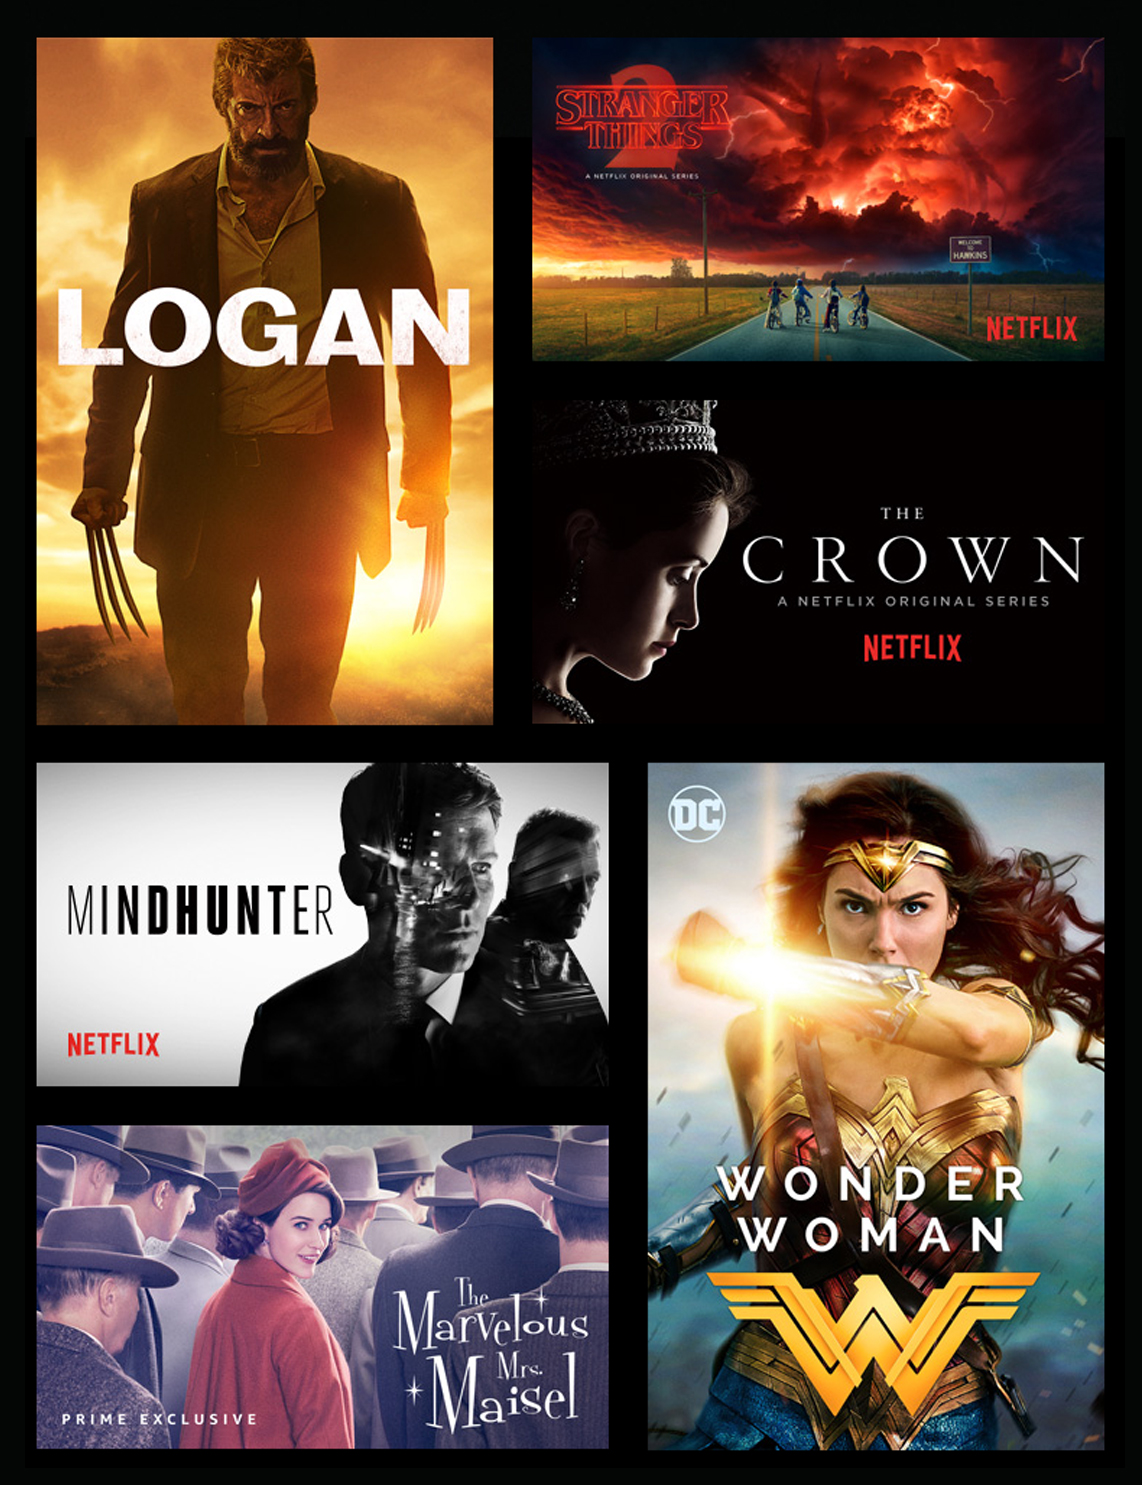 Apple_TV_4k-HDR-titles_20171206